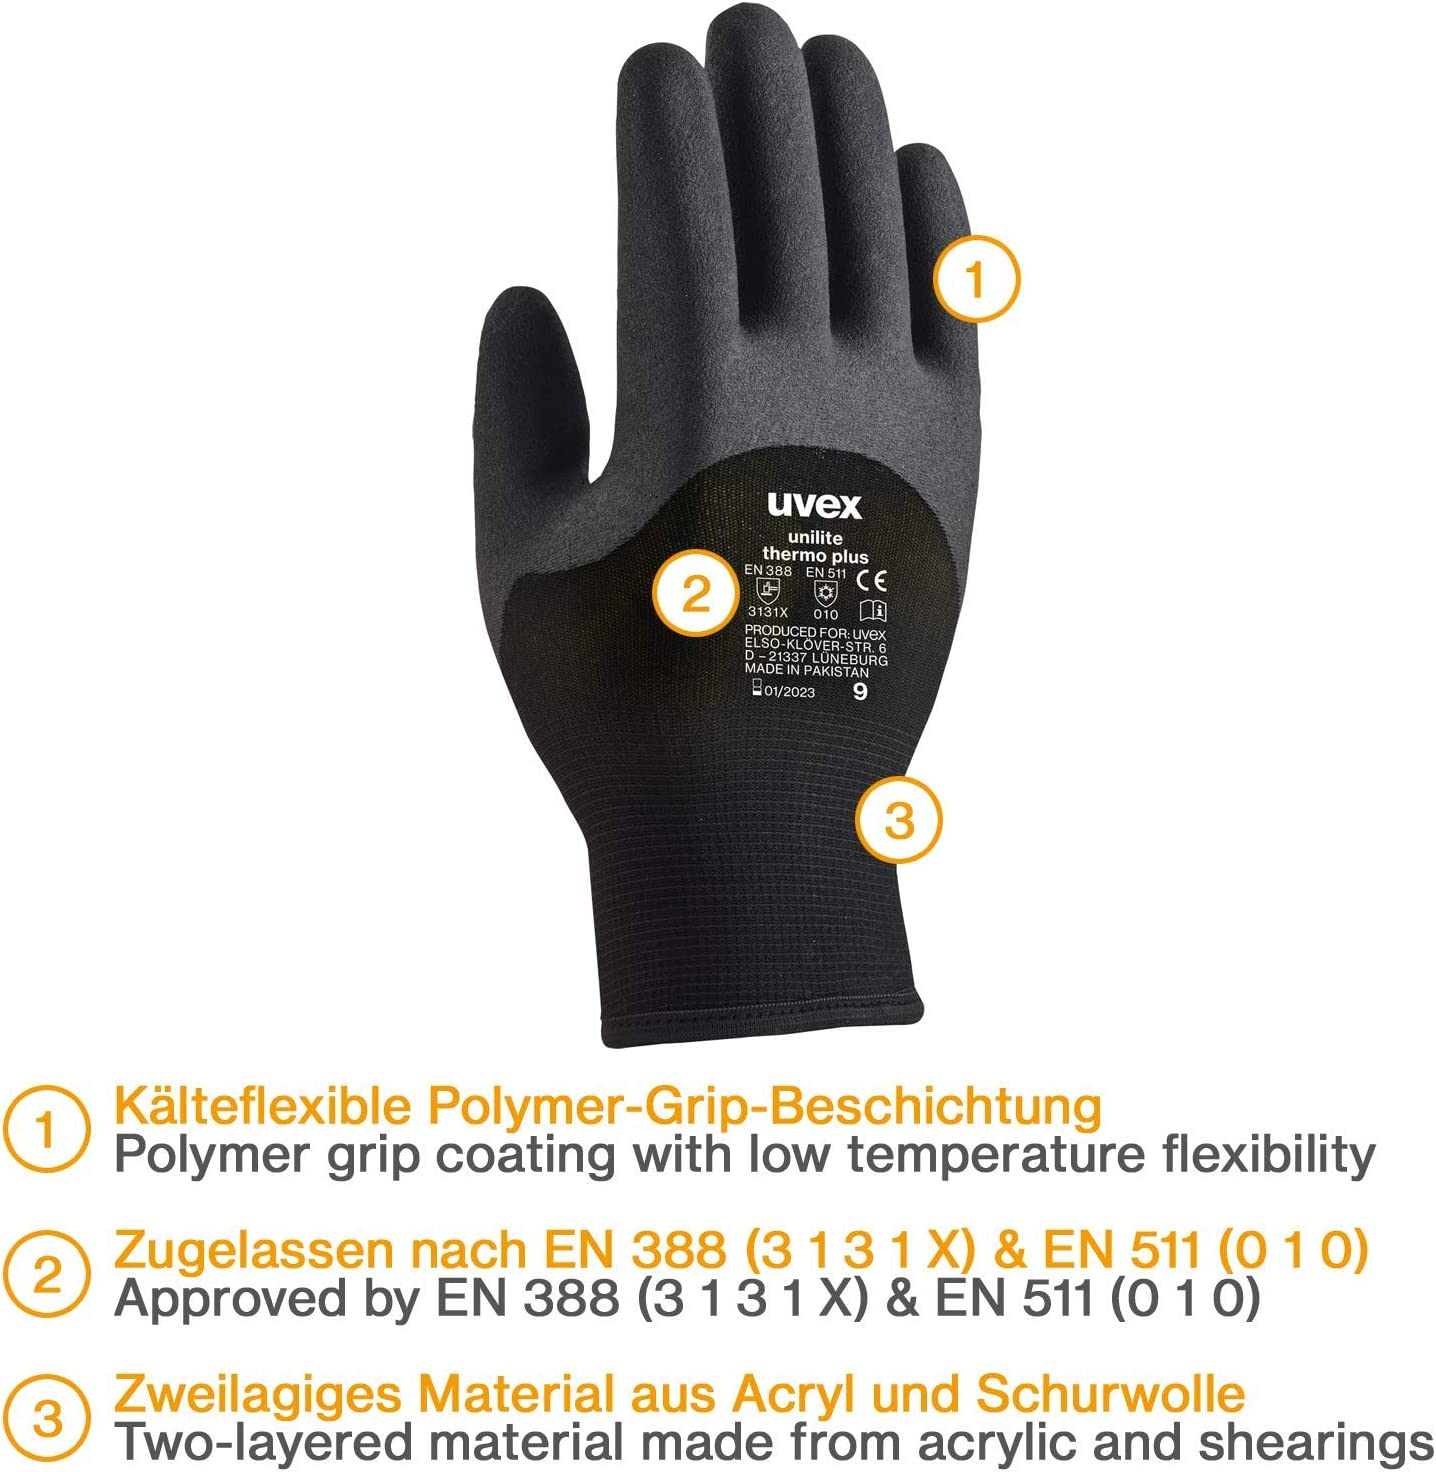 6-Teilig Rohrreinigungsschlauch 80 PROFESSIONAL f/ür K/ärcher Kr/änzle Professional HD HDS 63900290 /& 57630400 Anschluss 1//8 AG : M22 x 1,5 IG /& Bajonett-Adapter Messing M22 x 1,5 AG /& EASY!LOCK